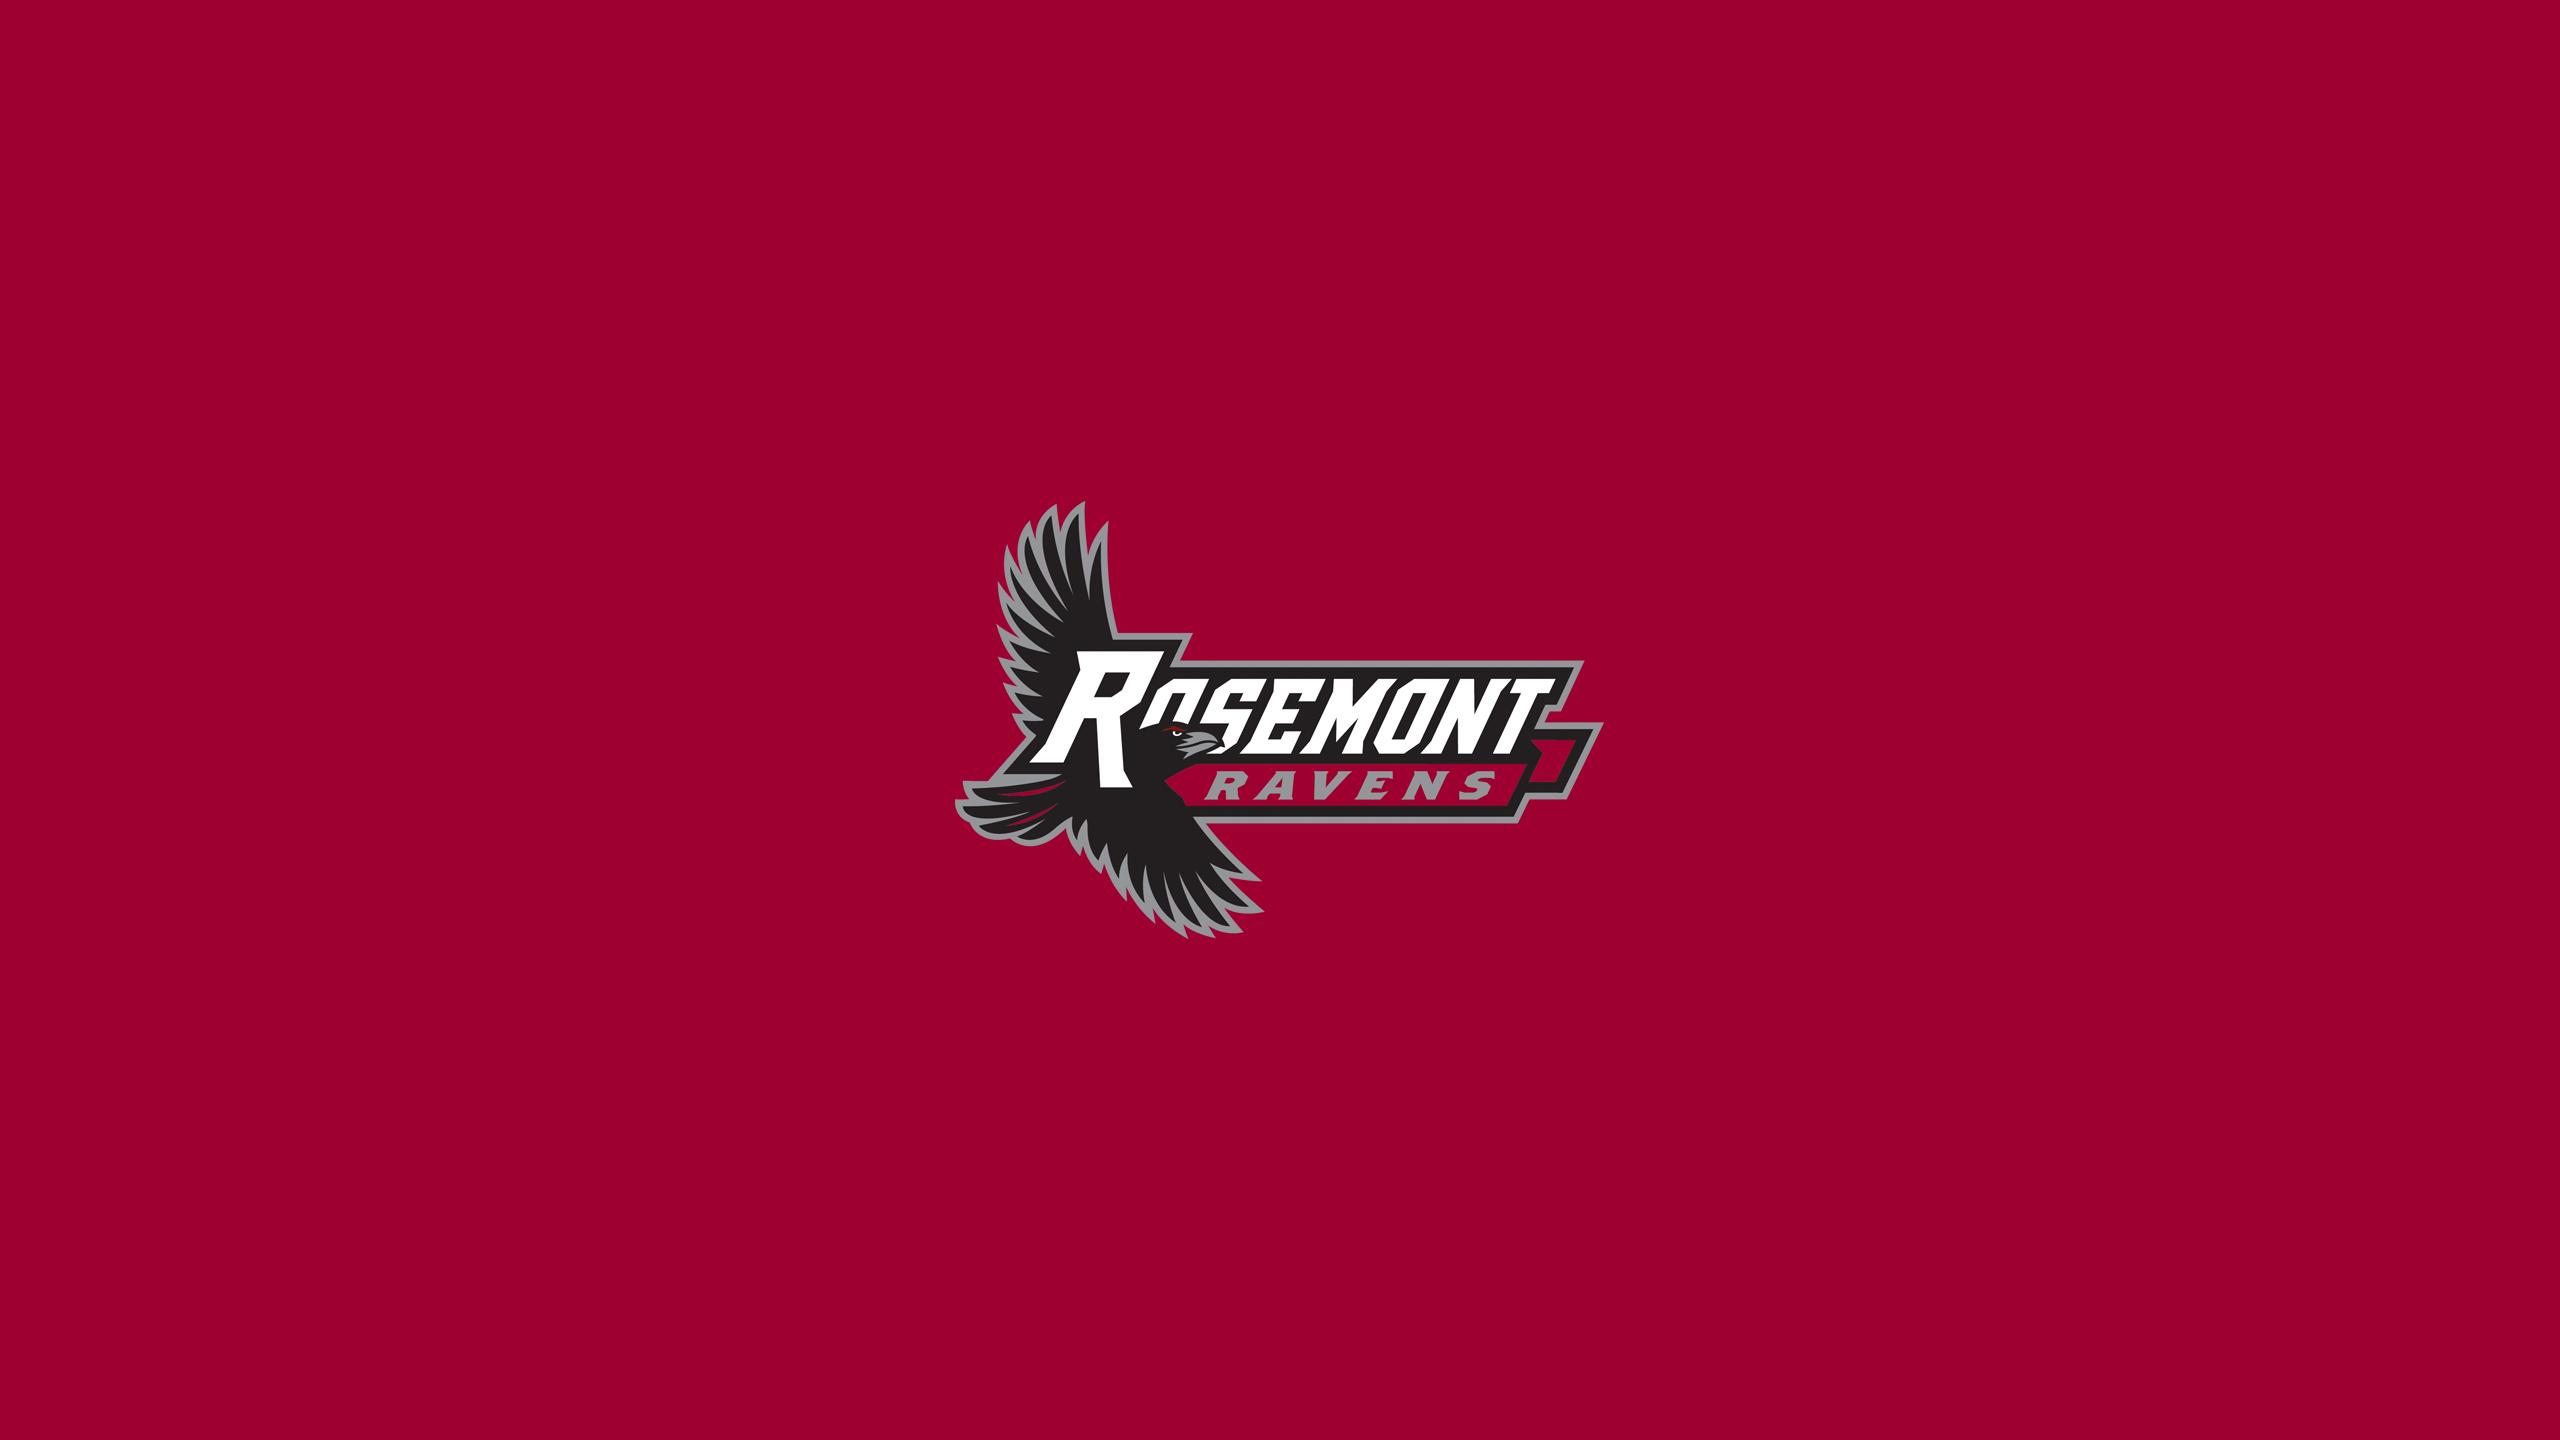 Rosemont (PA) College Ravens